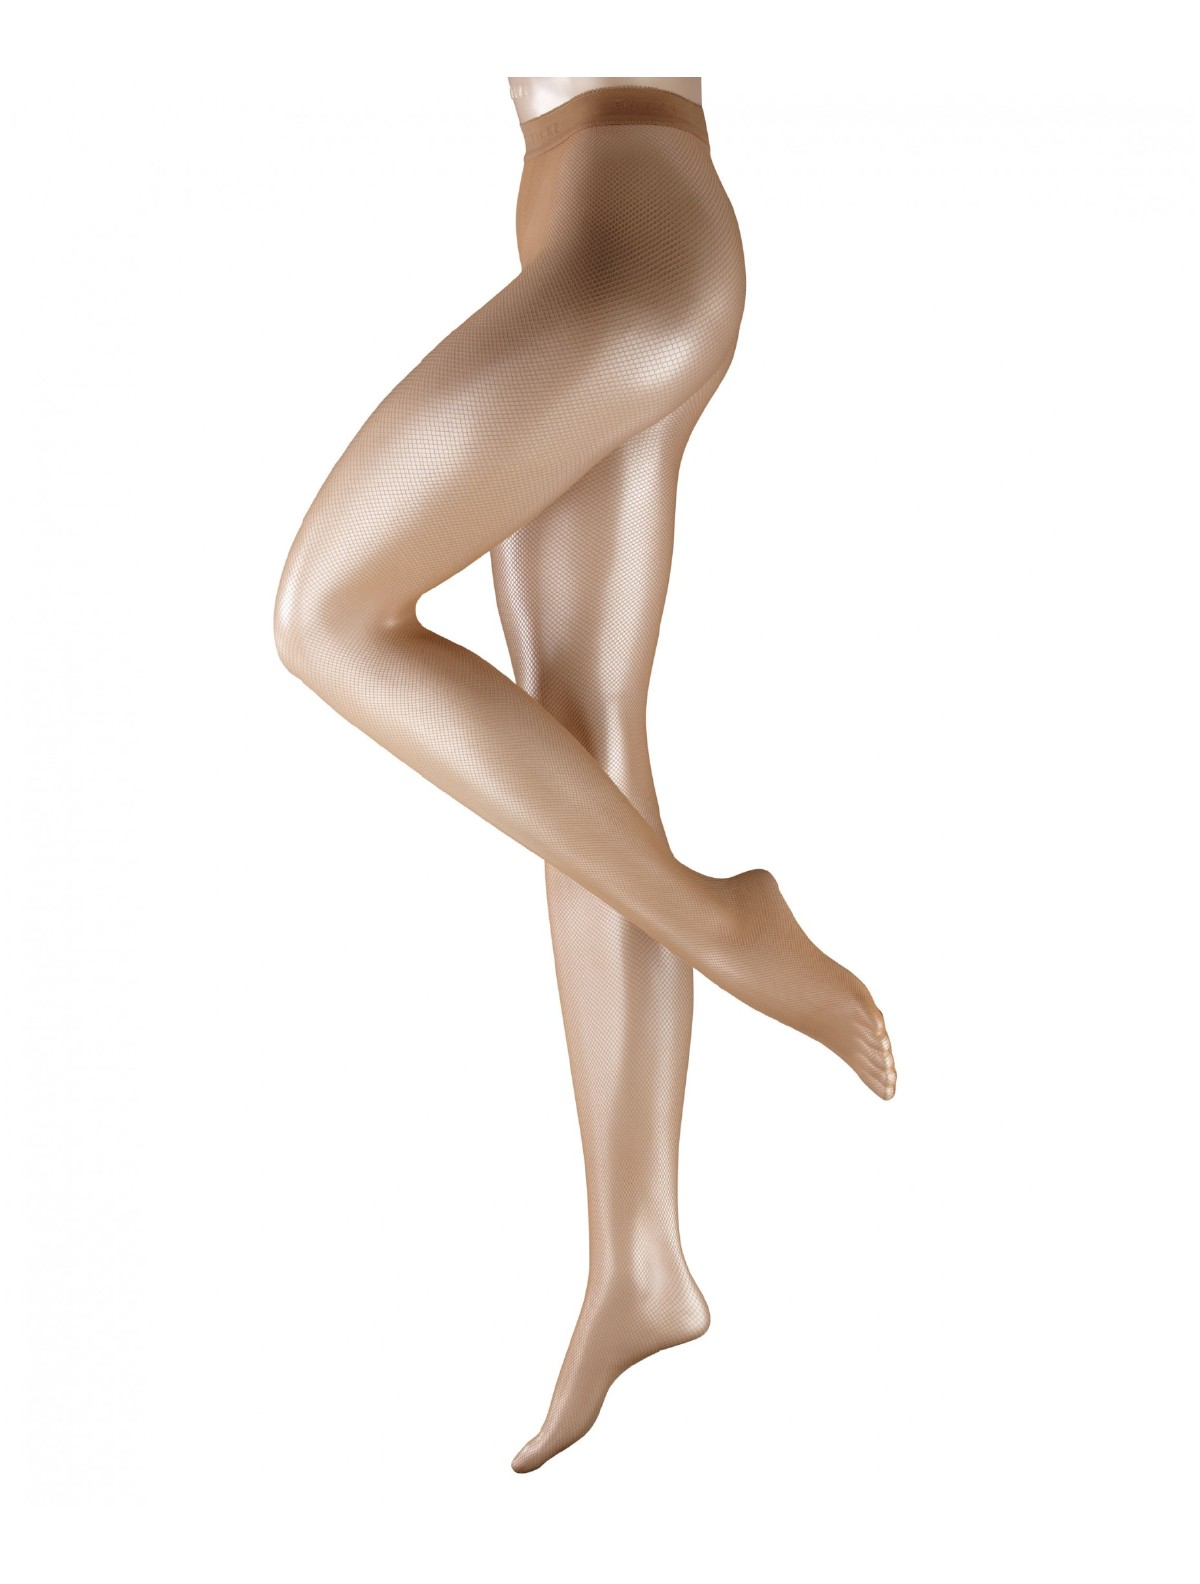 Sofia sandobar model